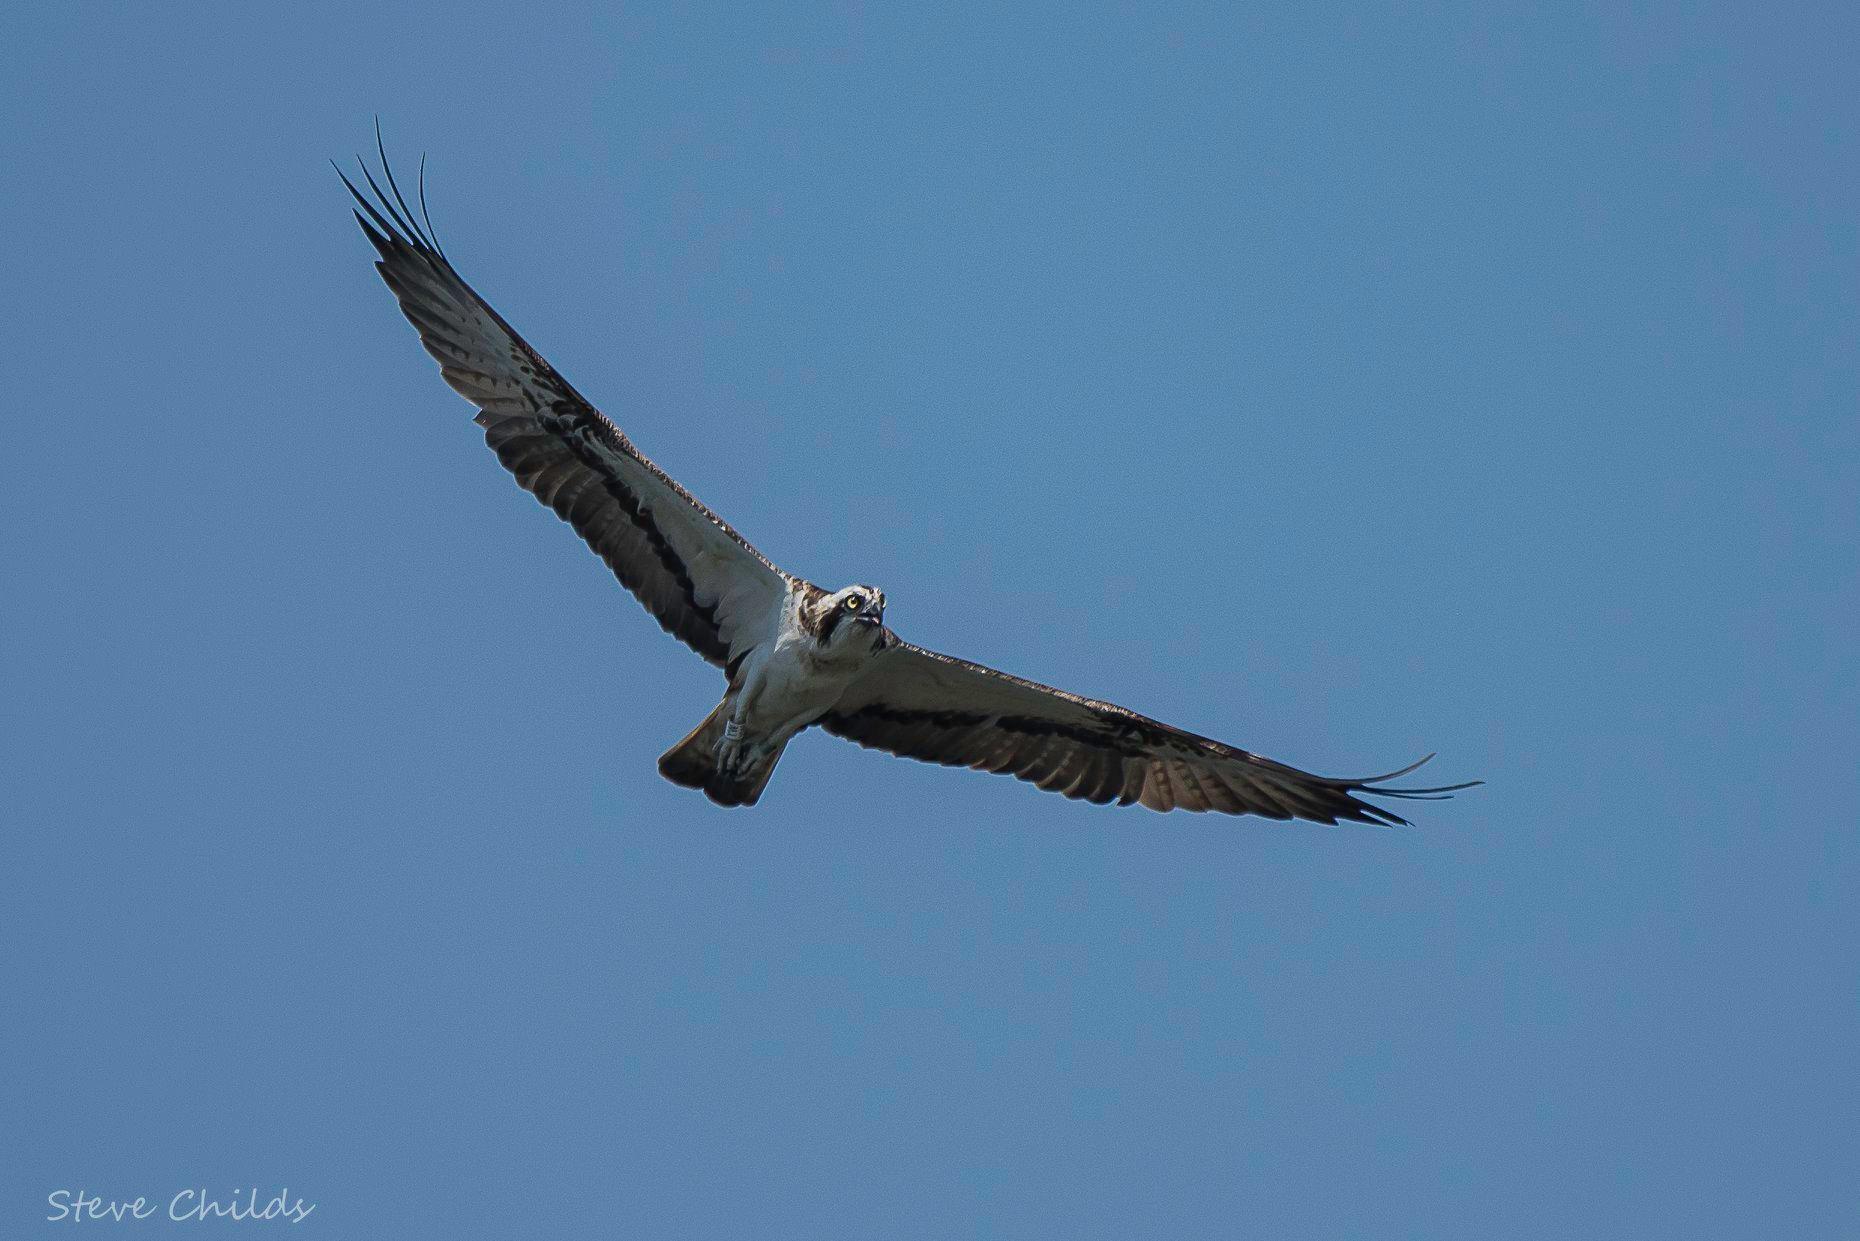 Osprey soaring - image courtesy of Steve Childs